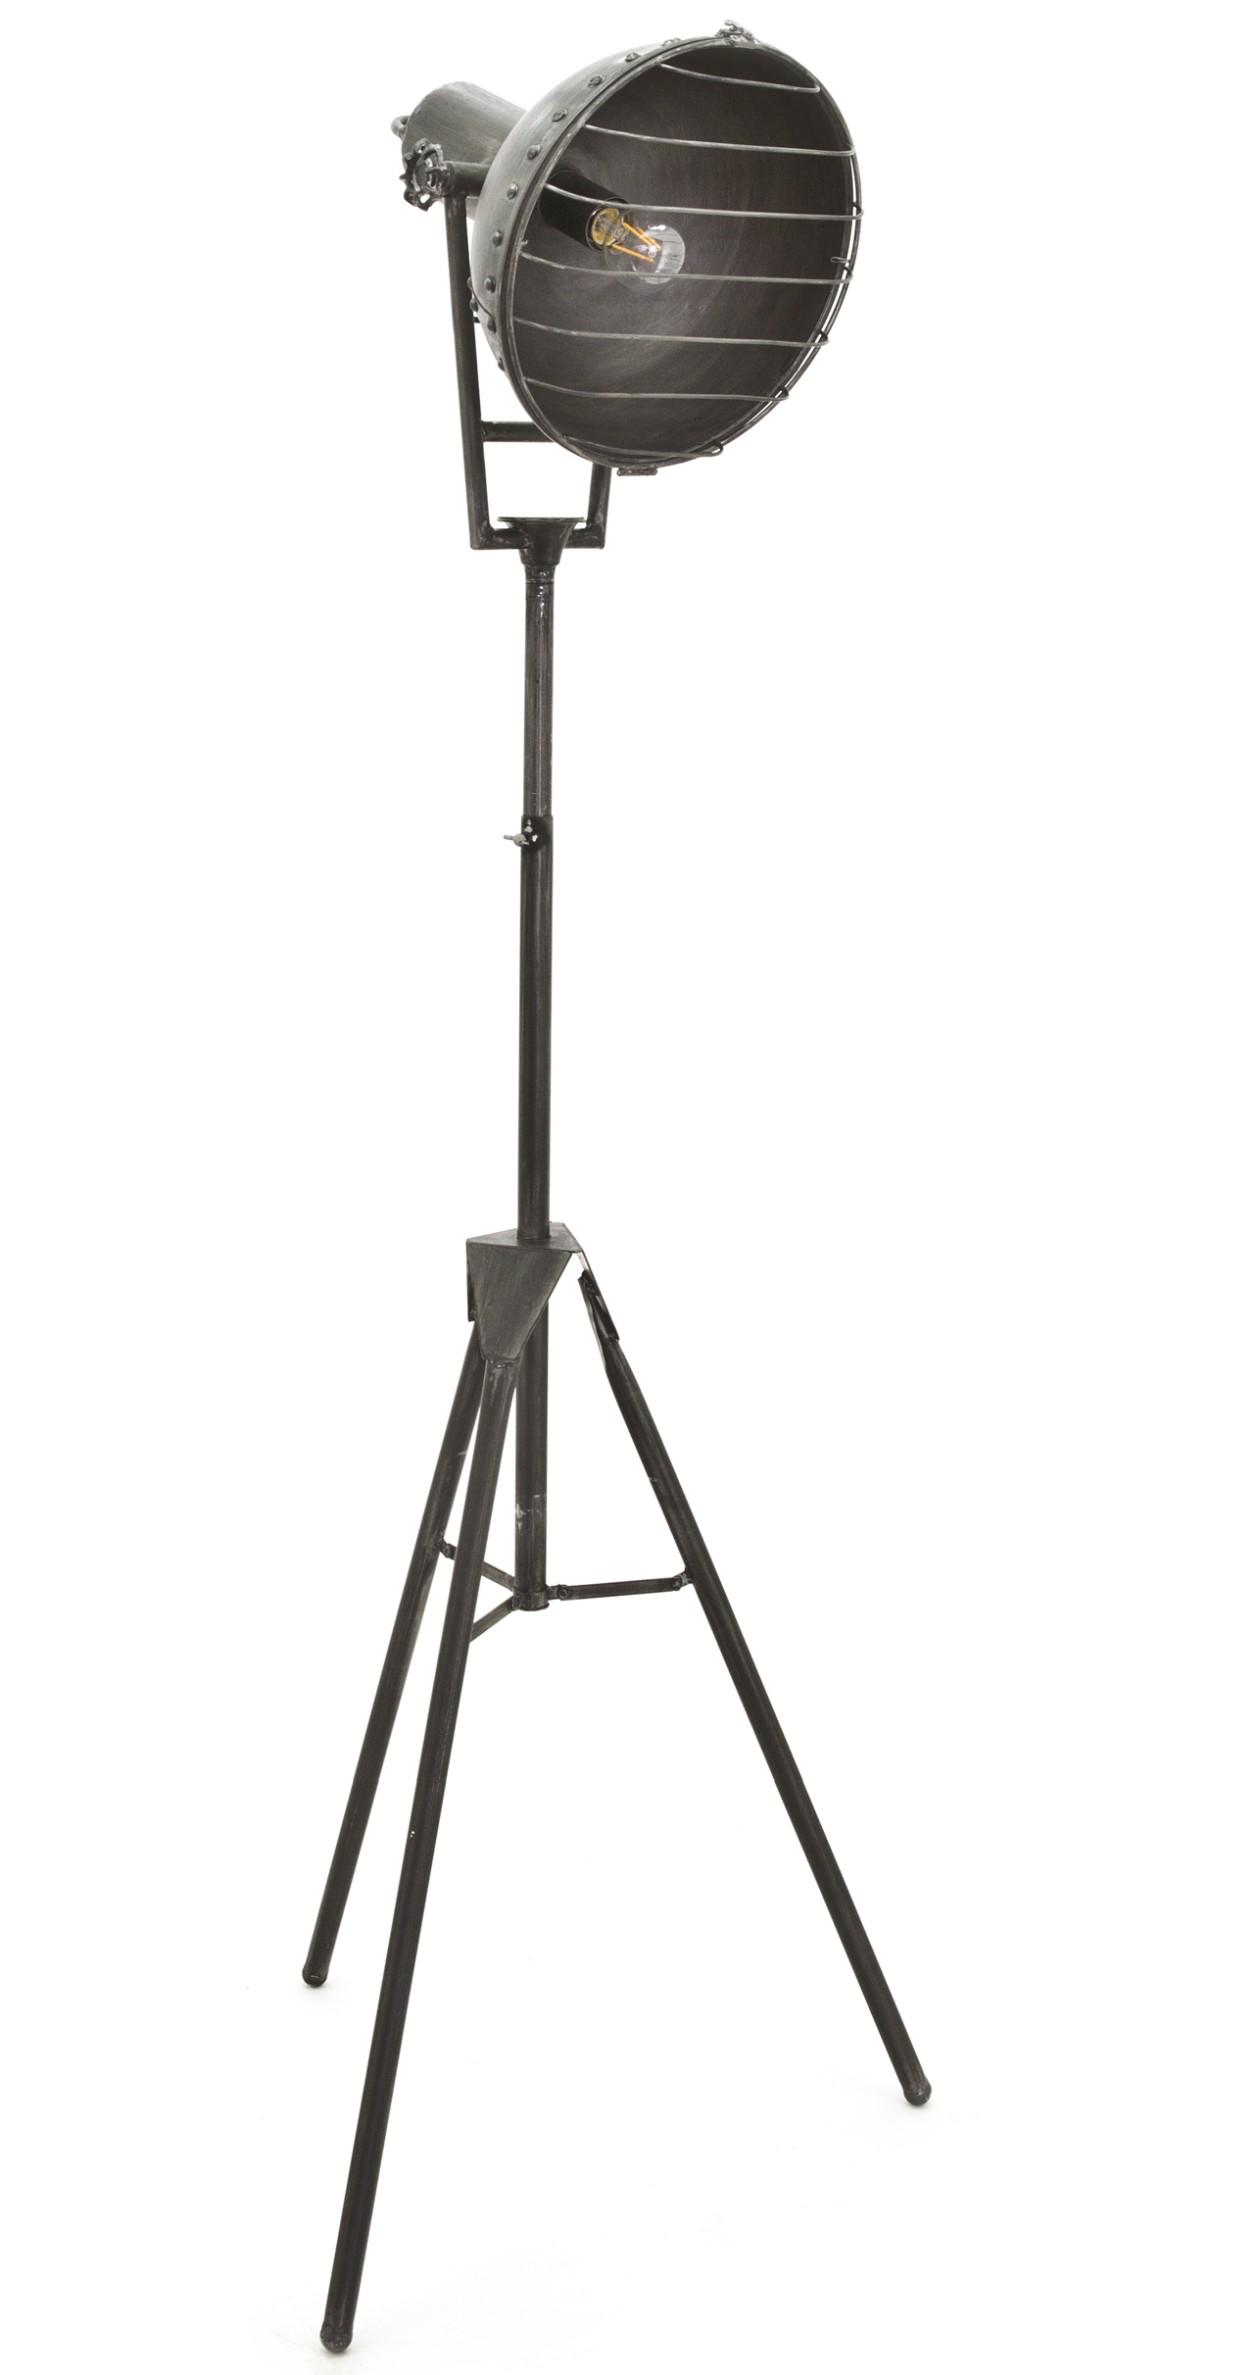 By-Boo Vloerlamp Heatwave - H150 Cm - Grijs